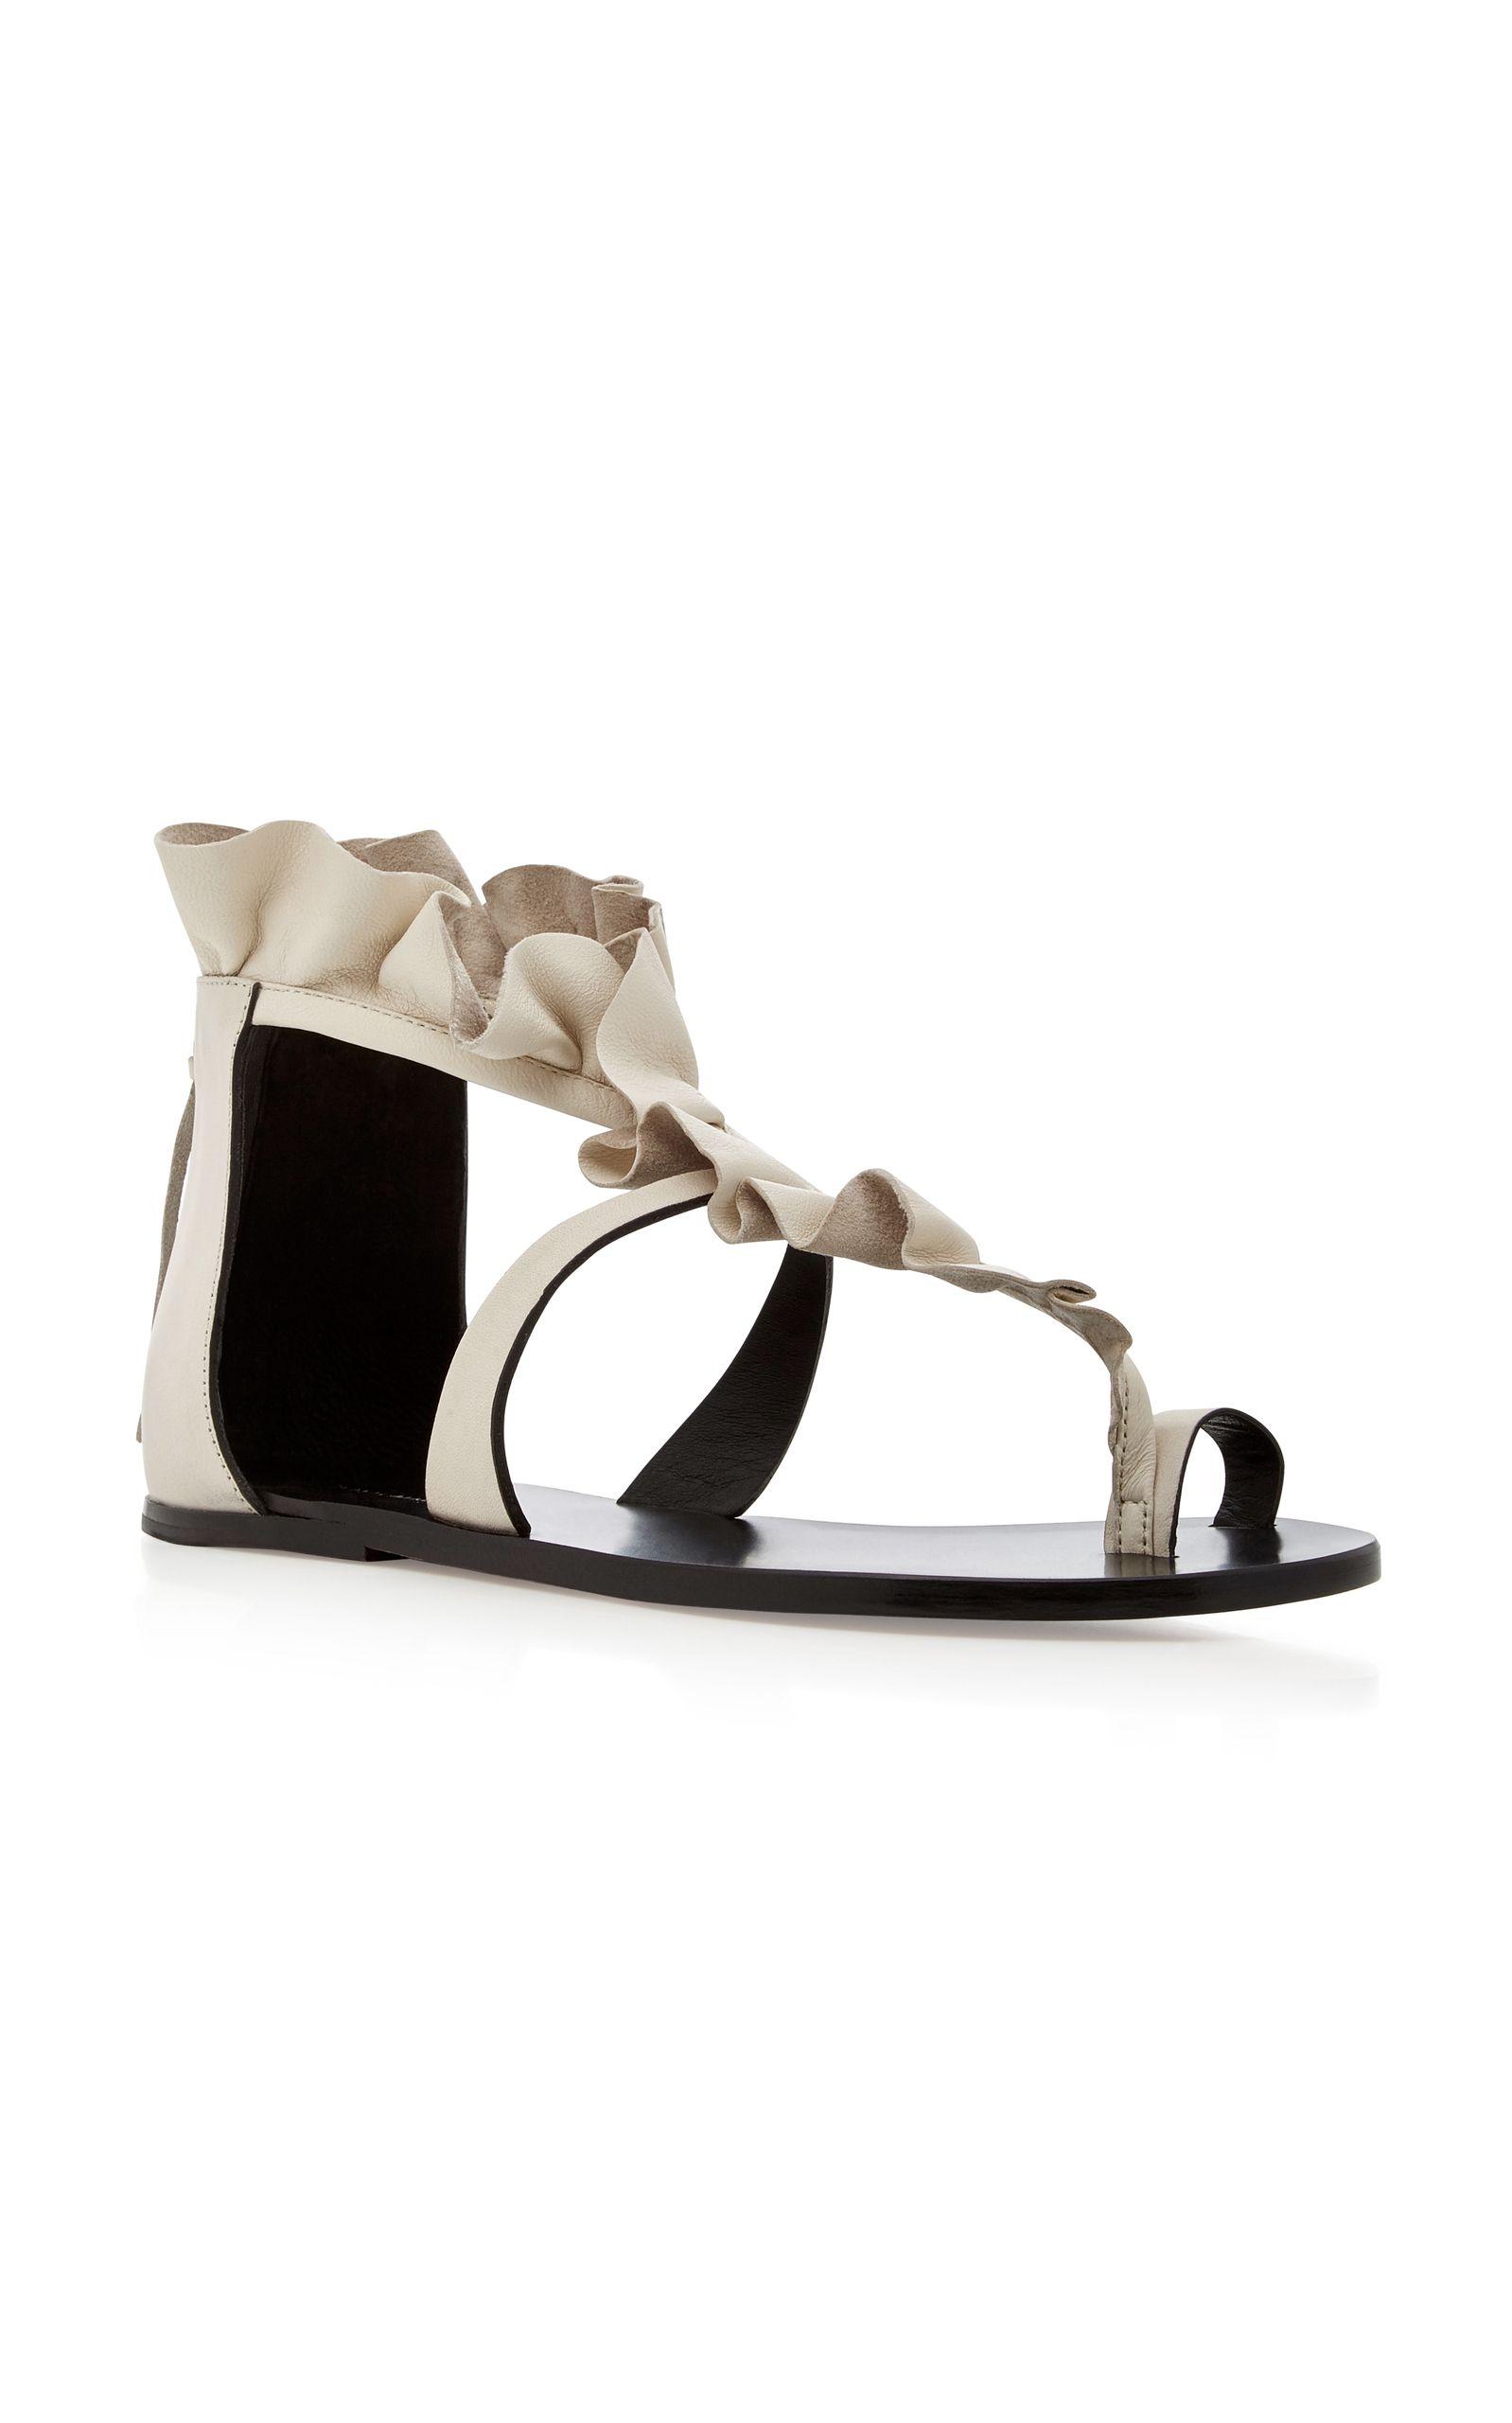 ISABEL MARANT . #isabelmarant #shoes #sandals